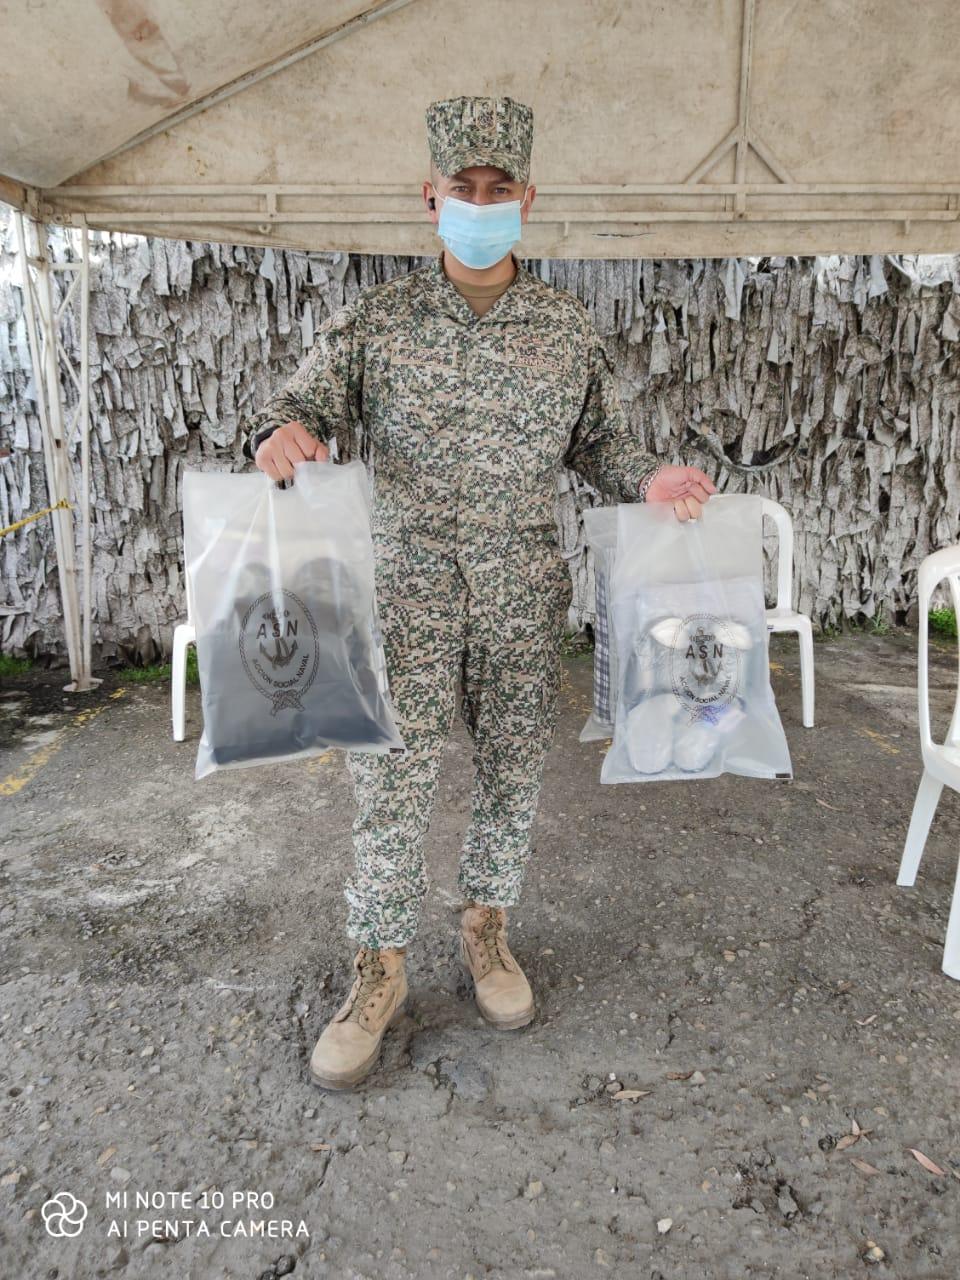 Apoyo al Suboficial e Infantes heridos en ataque a las tropas